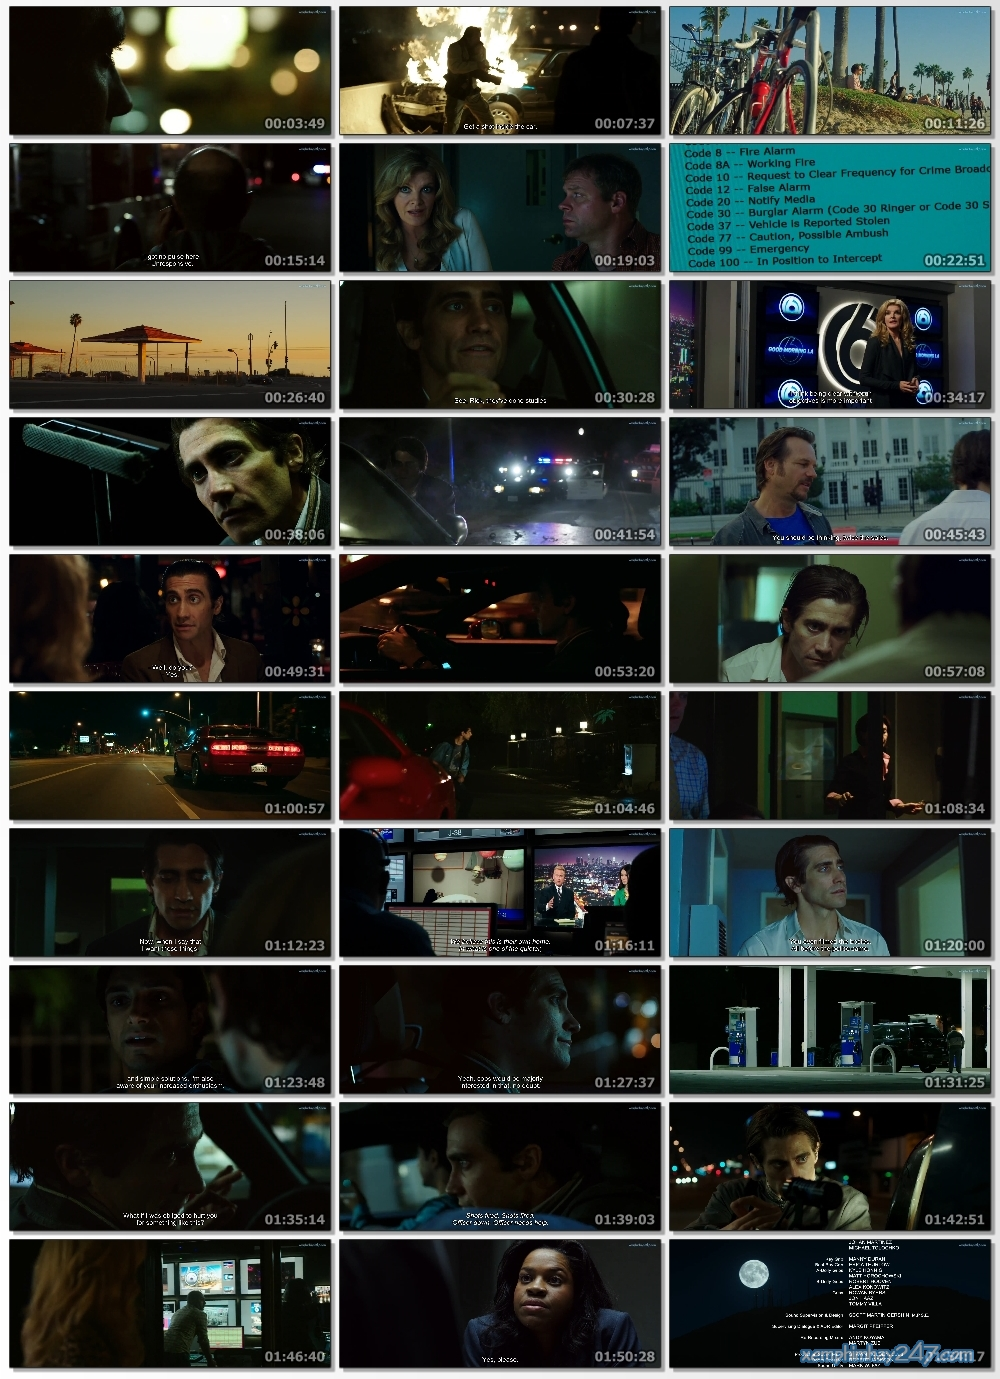 http://xemphimhay247.com - Xem phim hay 247 - Kẻ Săn Tin Đen (2014) - Nightcrawler (2014)